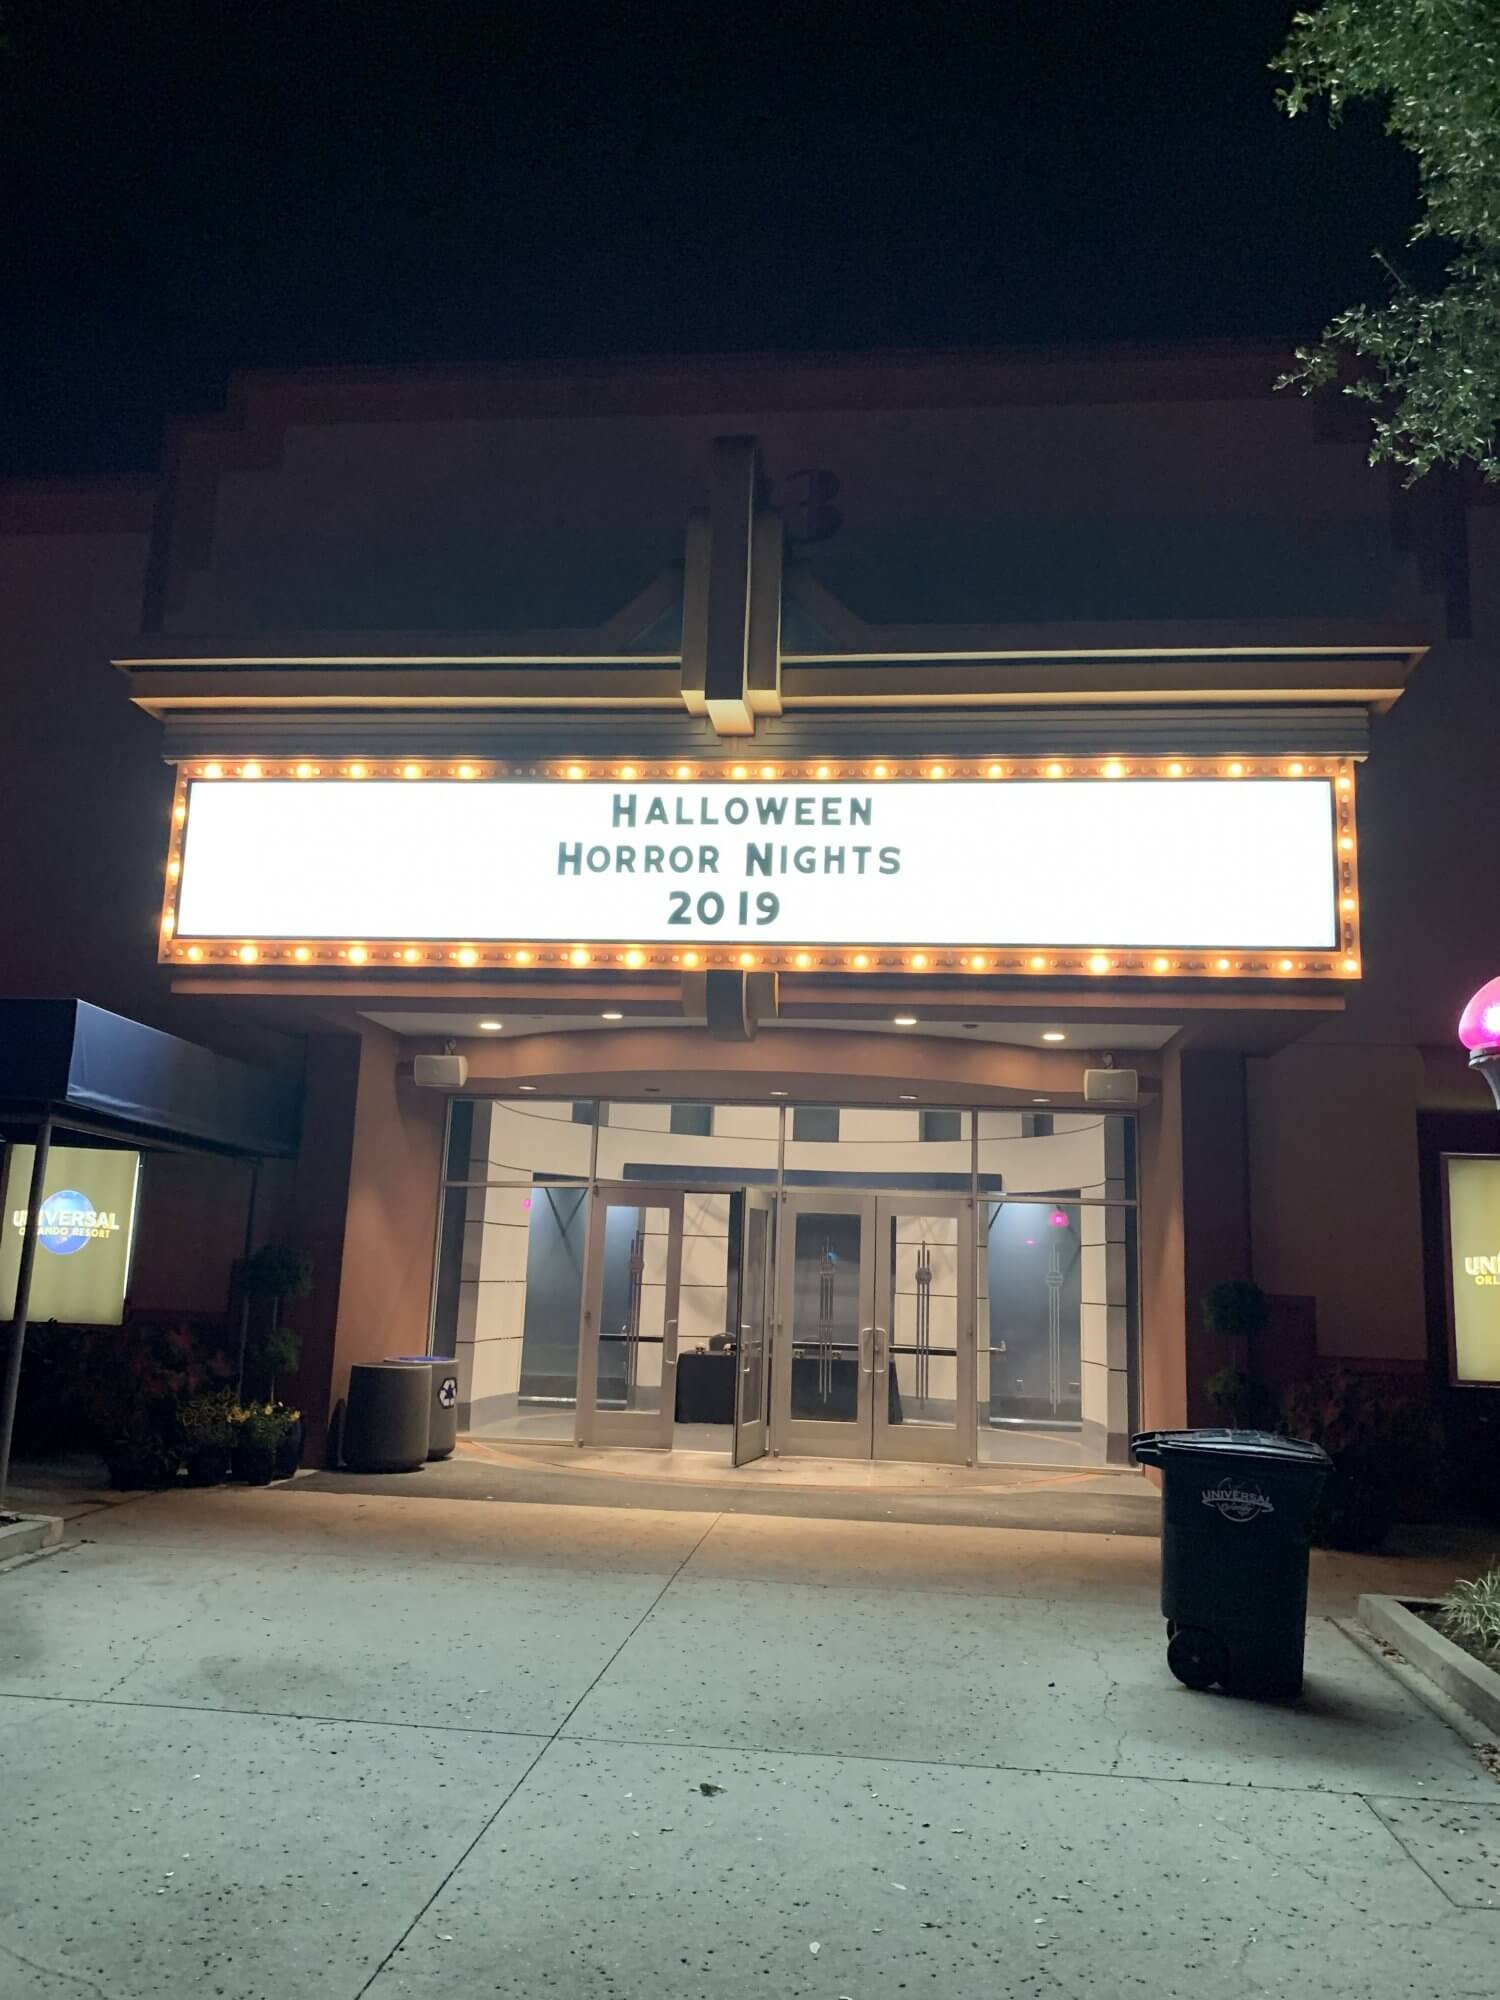 Universal Halloween Horror Nights 2019 HHN29 Theater Marquee